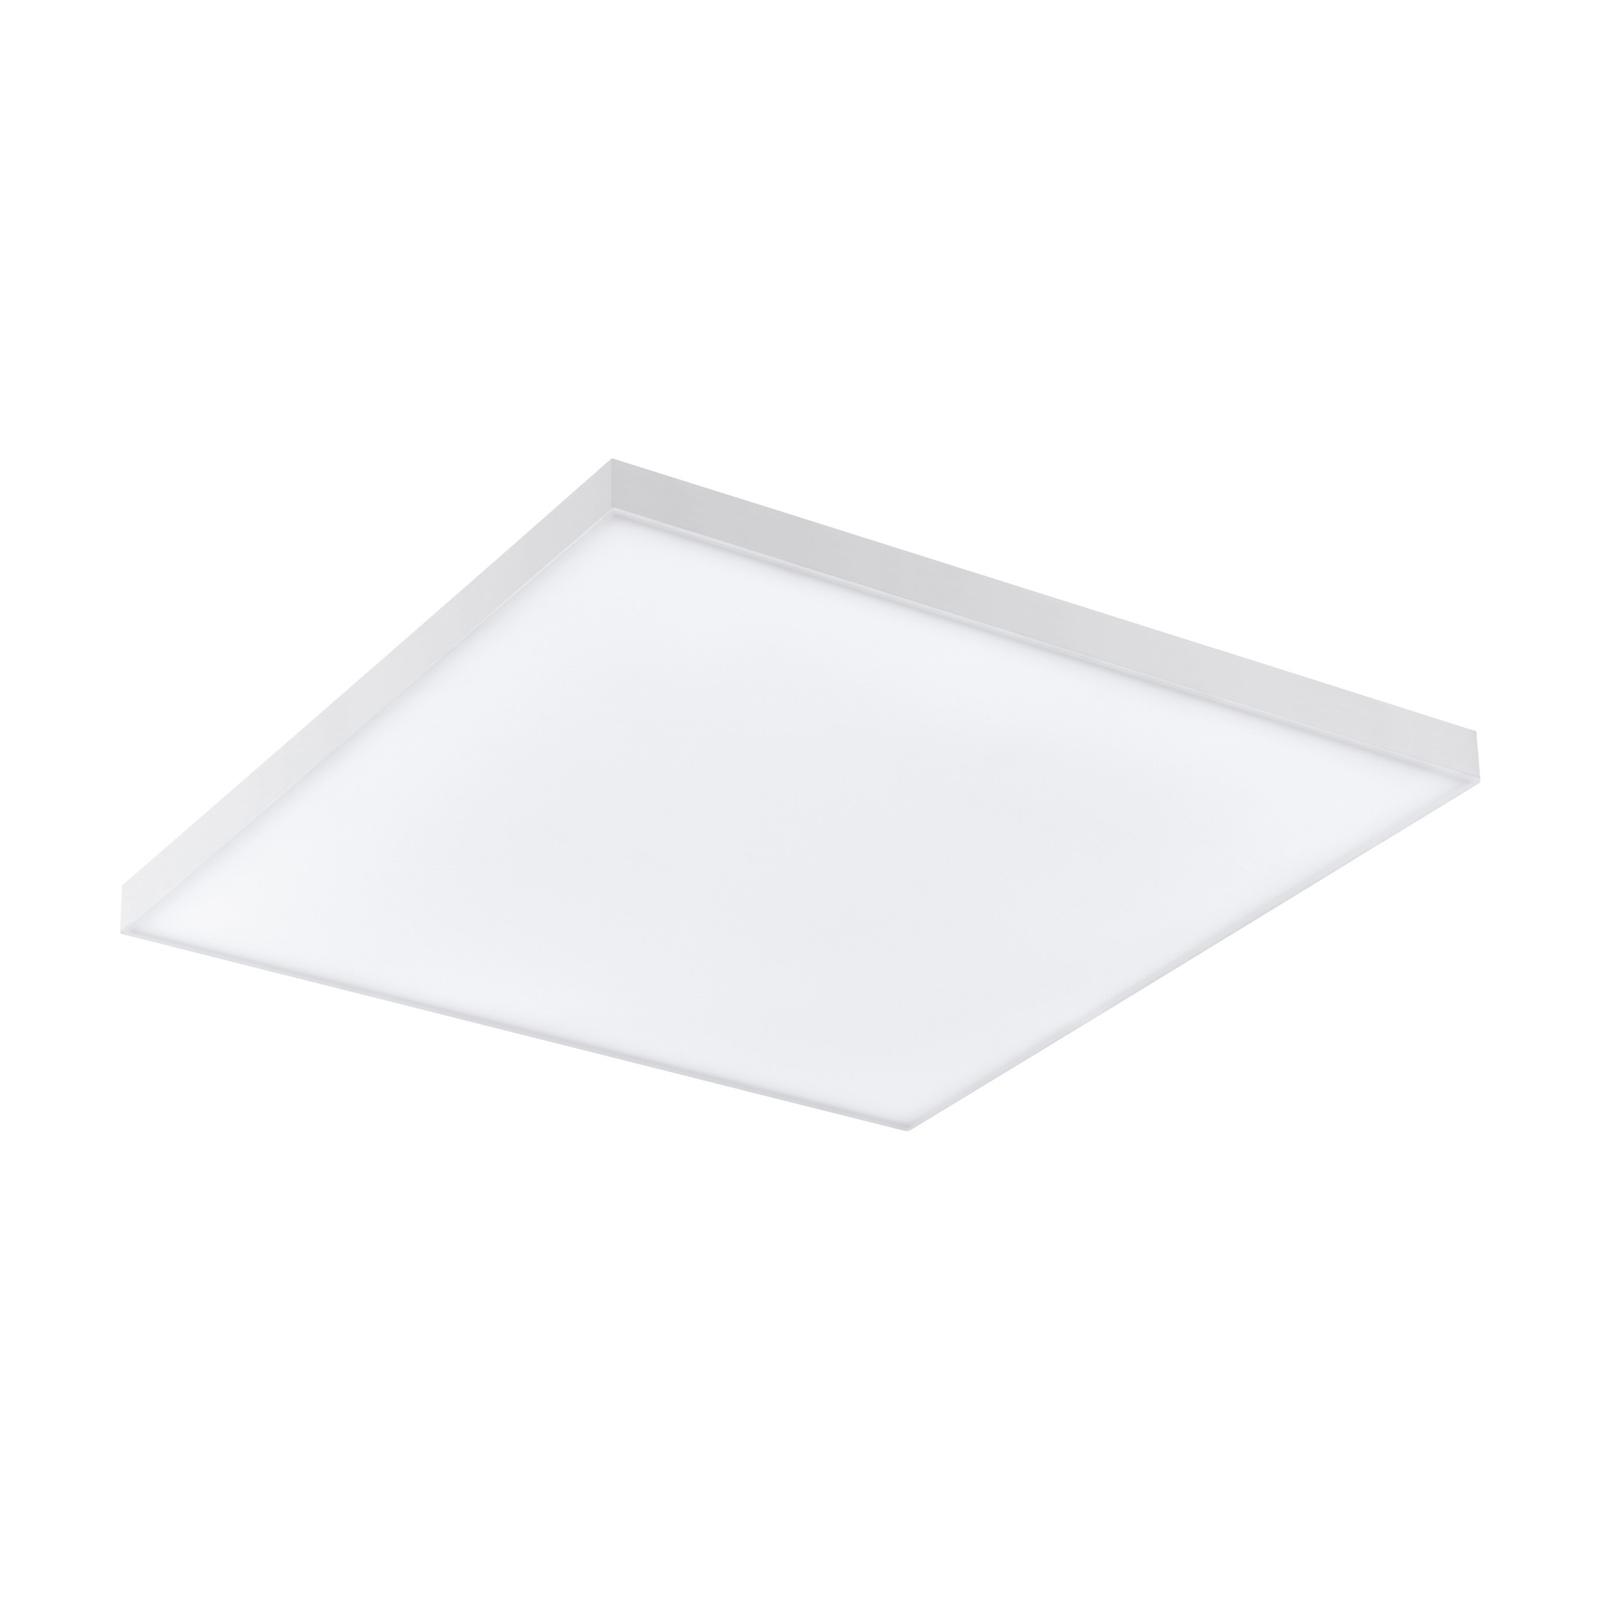 Lampa sufitowa LED Turcona, 30 x 30 cm